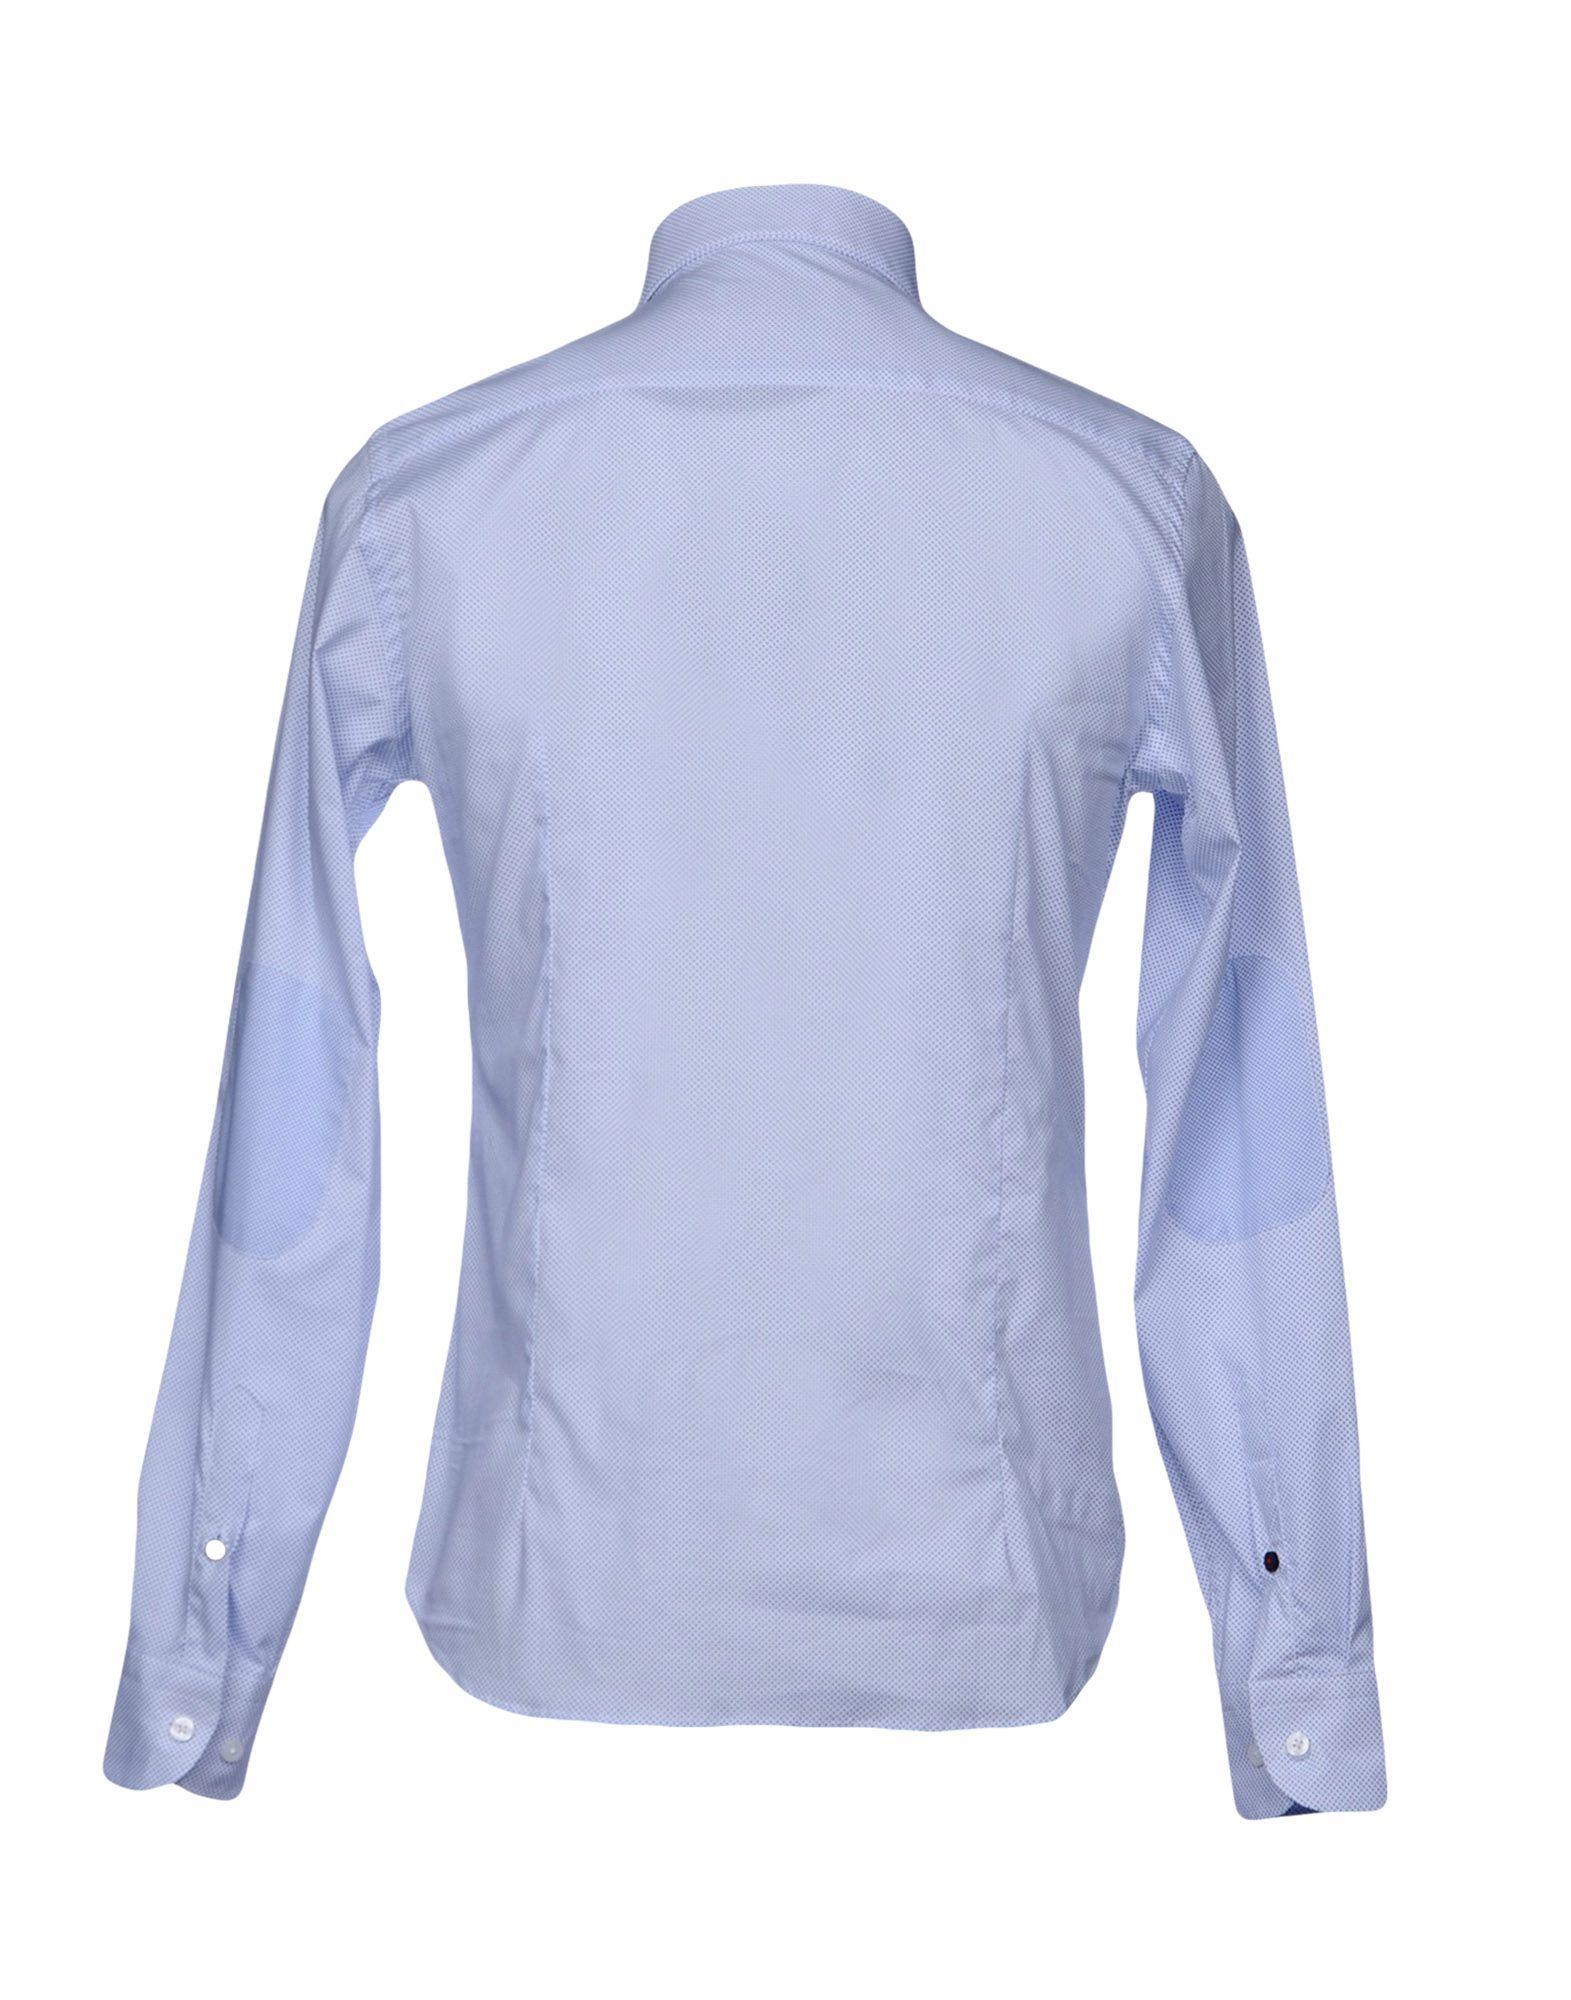 Hamaki-Ho Blue Cotton Shirt